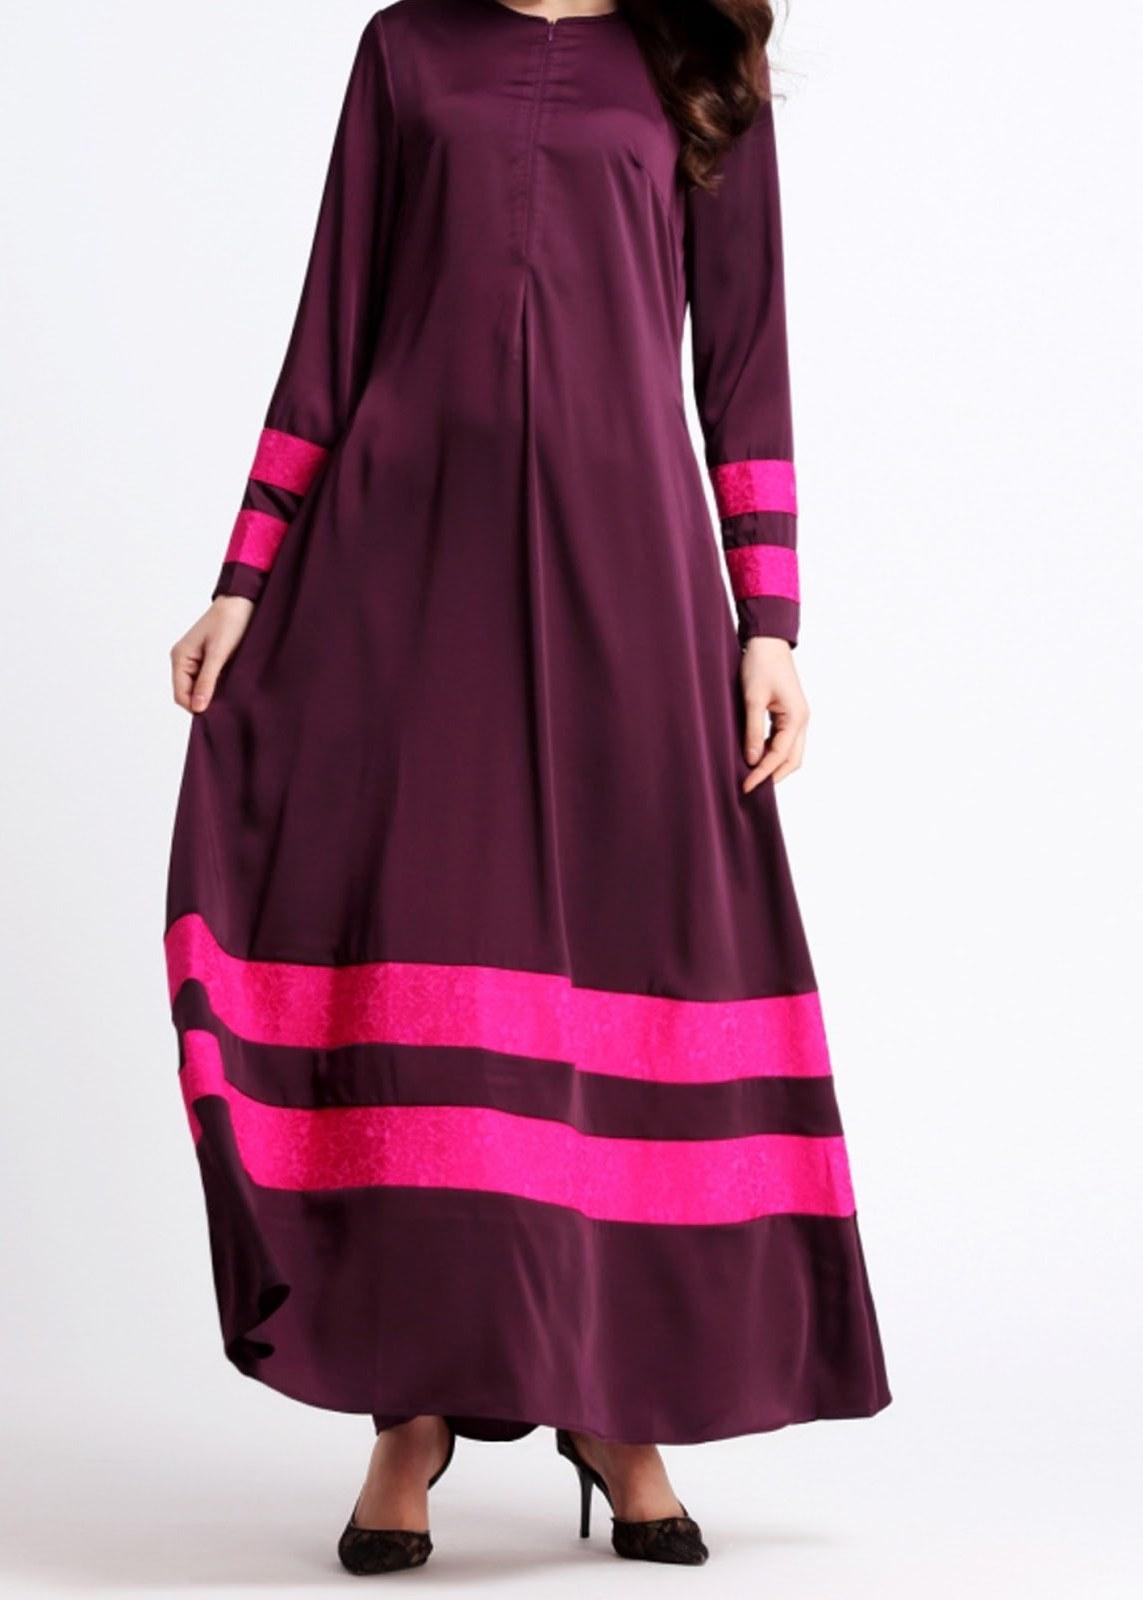 Ide Jual Baju Pengantin Muslimah Syar'i J7do norzi Beautilicious House Nbh0491 Insyikah Jubah Nursing